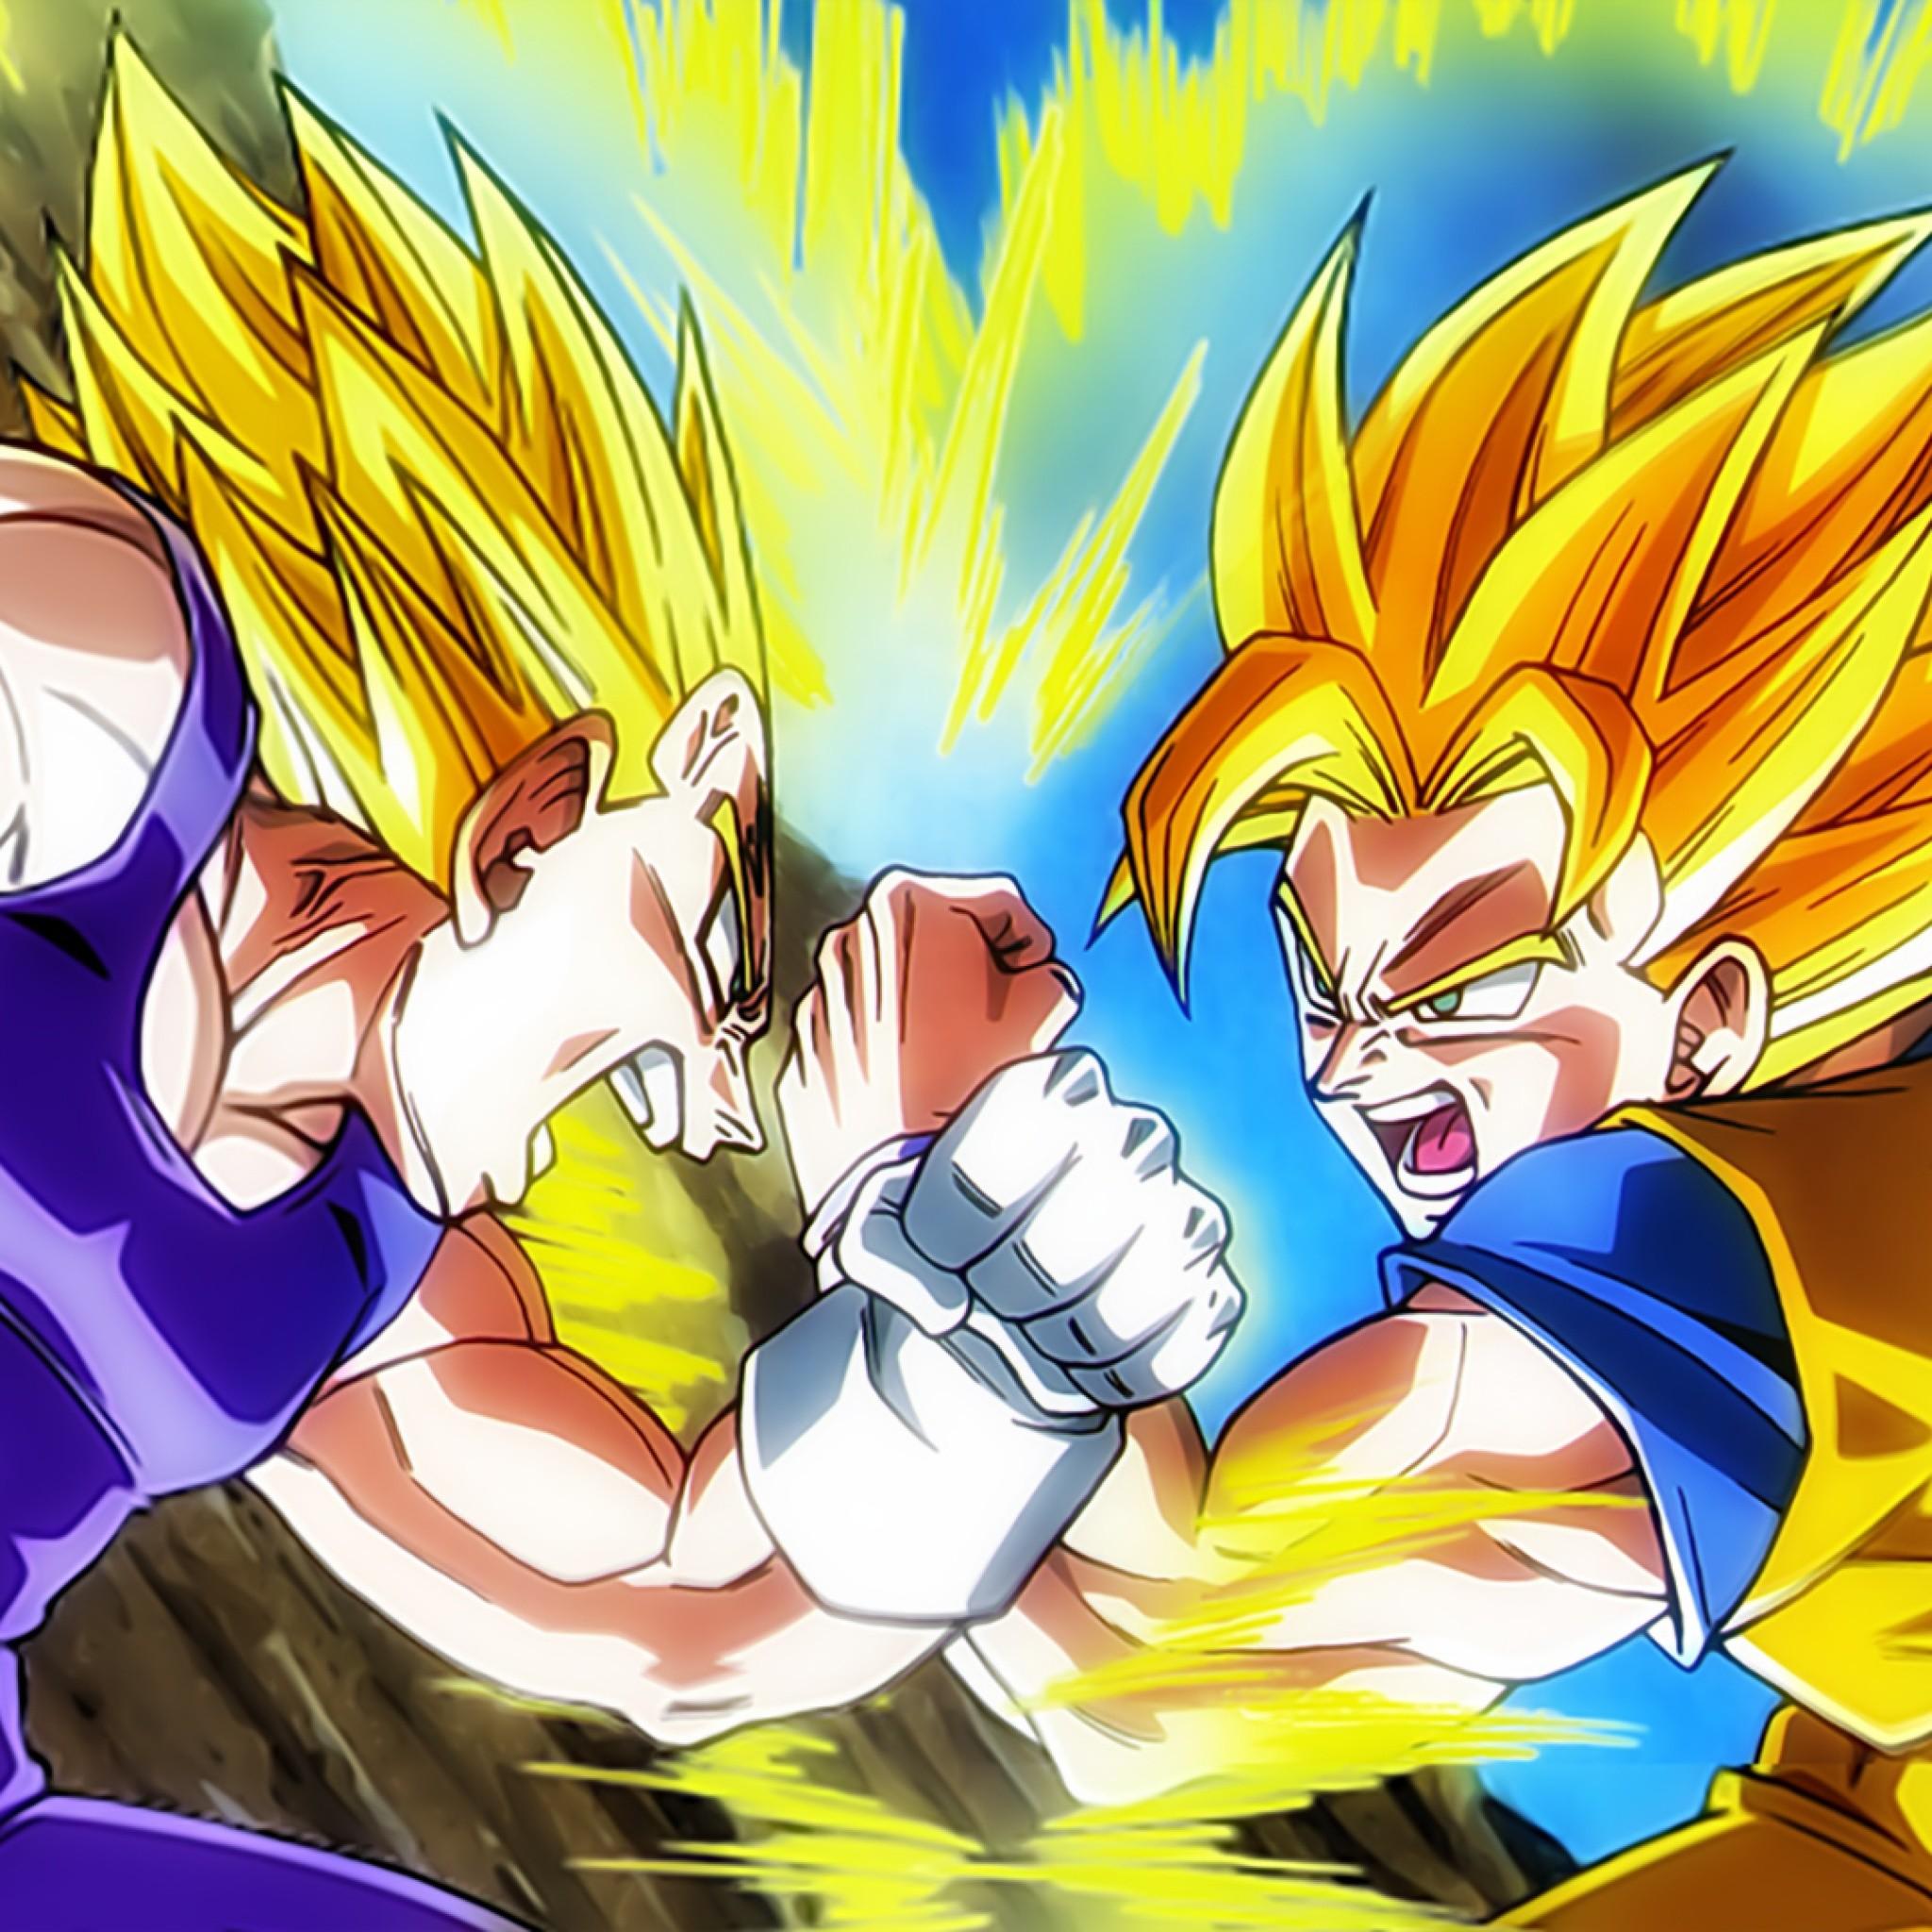 Goku Wallpaper Hd: Goku Vs Vegeta Wallpaper (65+ Images